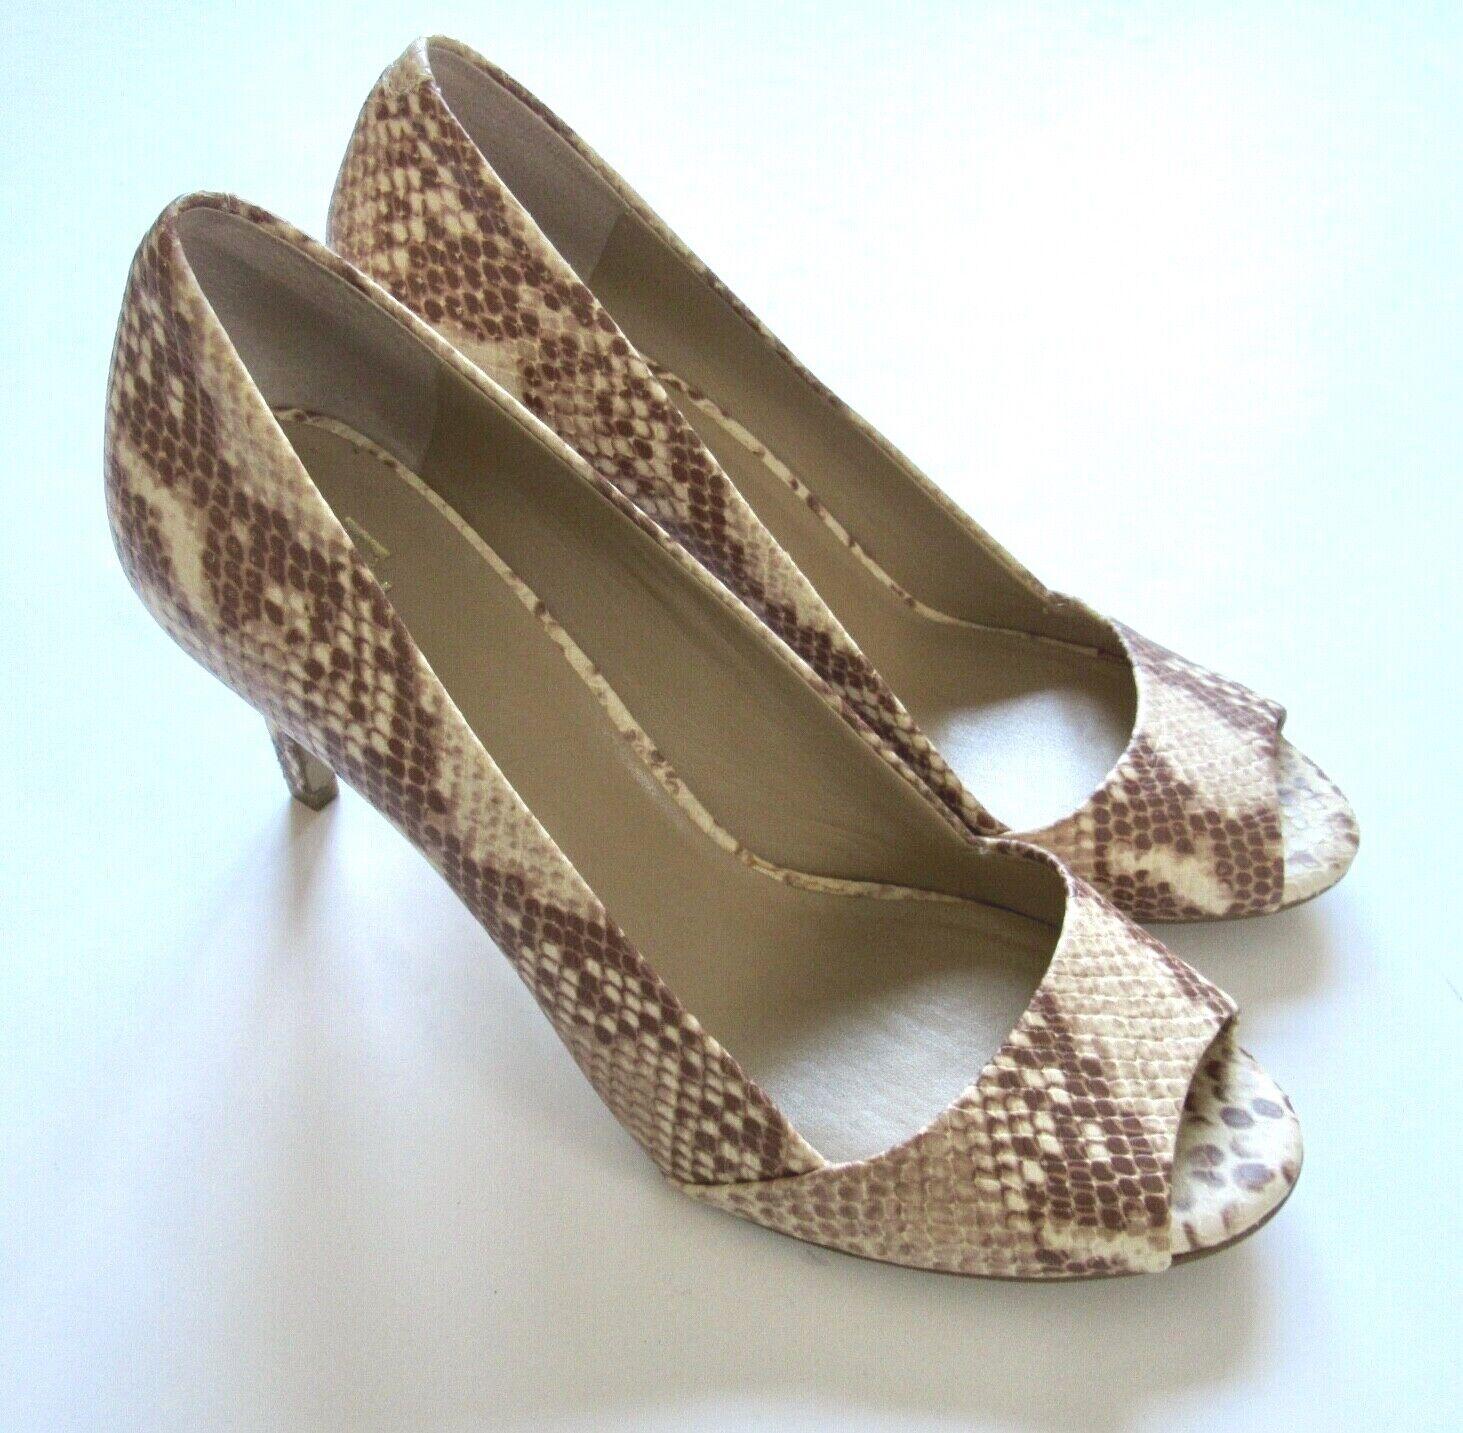 Ann Taylor Women's Leather Tan Brown Snake Print Heels Pumps Open Toe 9 M